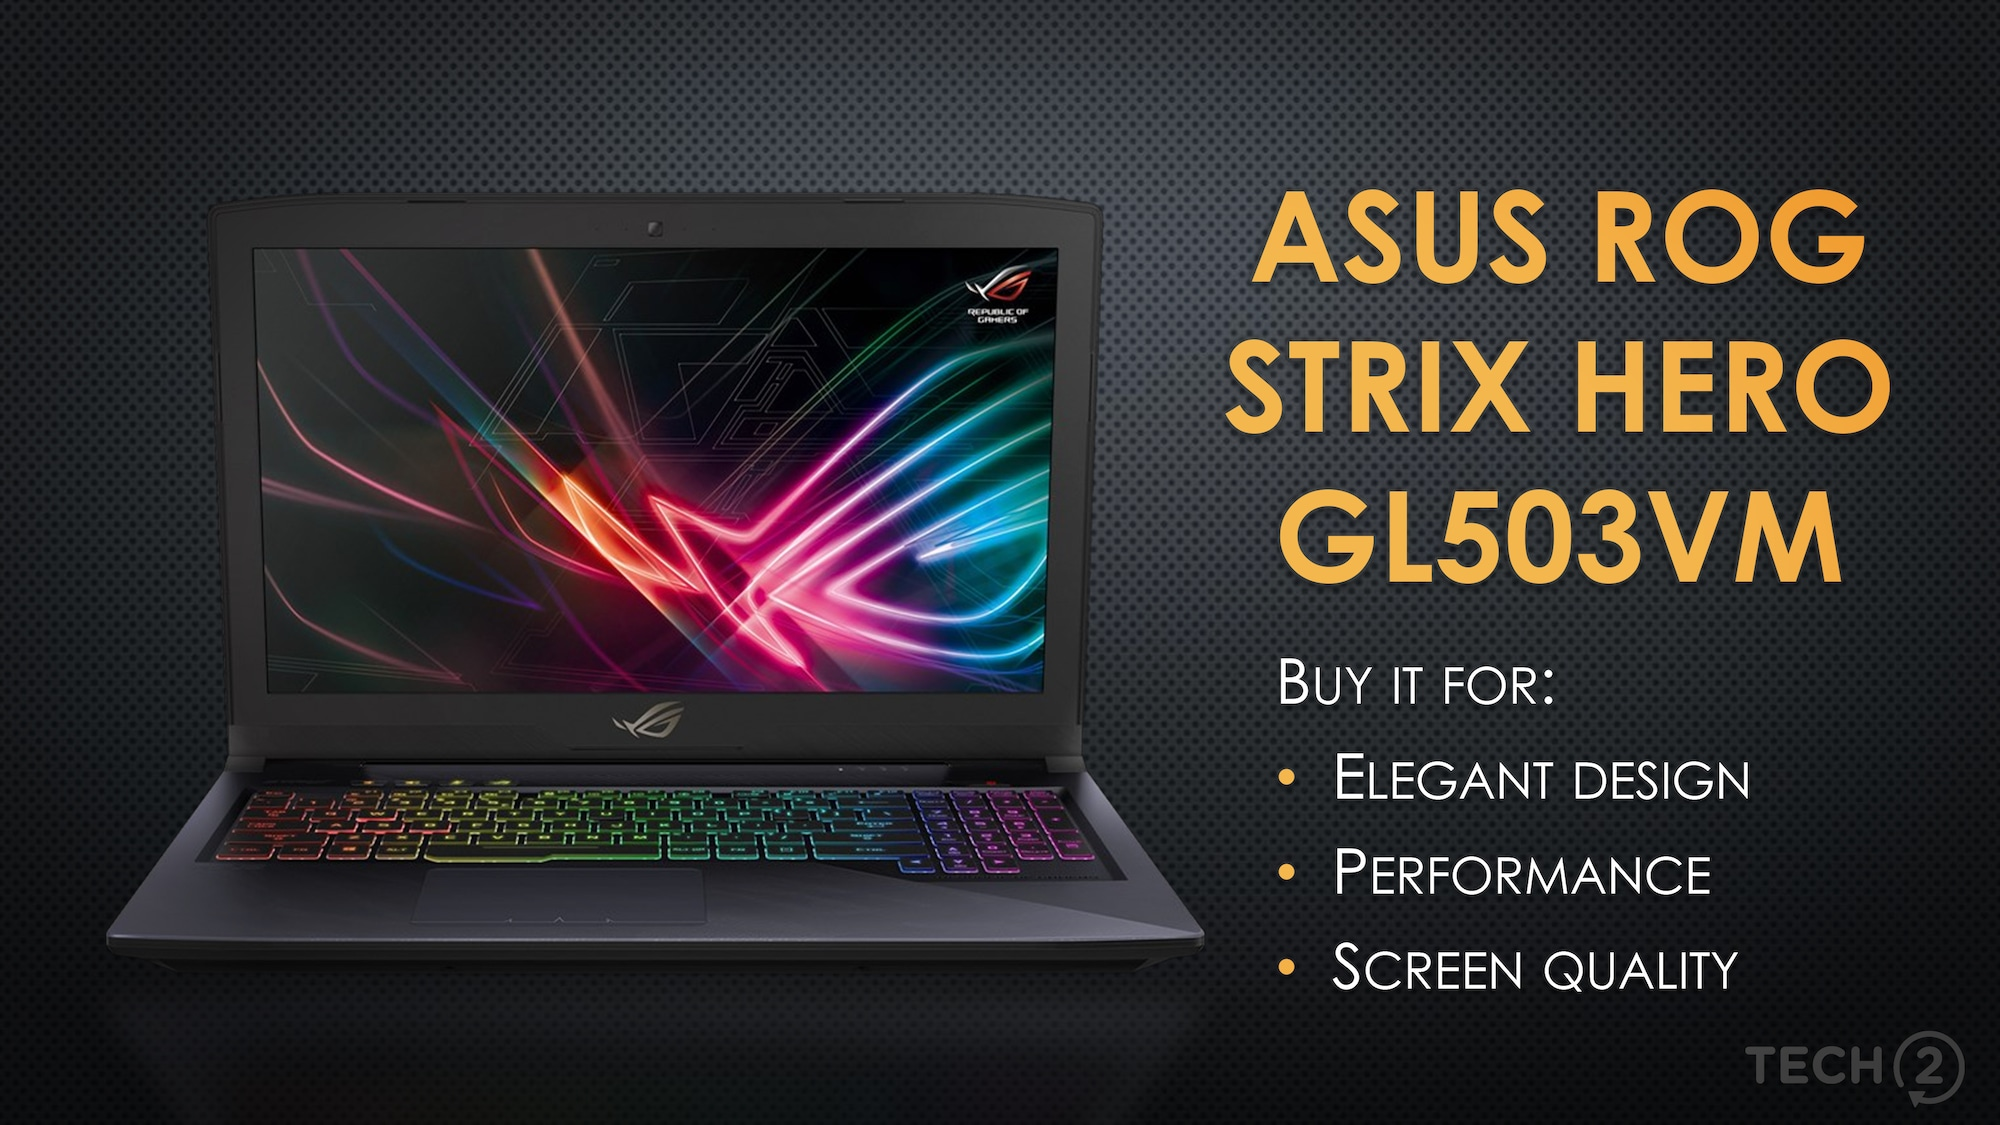 ASUS ROG Strix Hero Edition GL503VM gaming laptop review